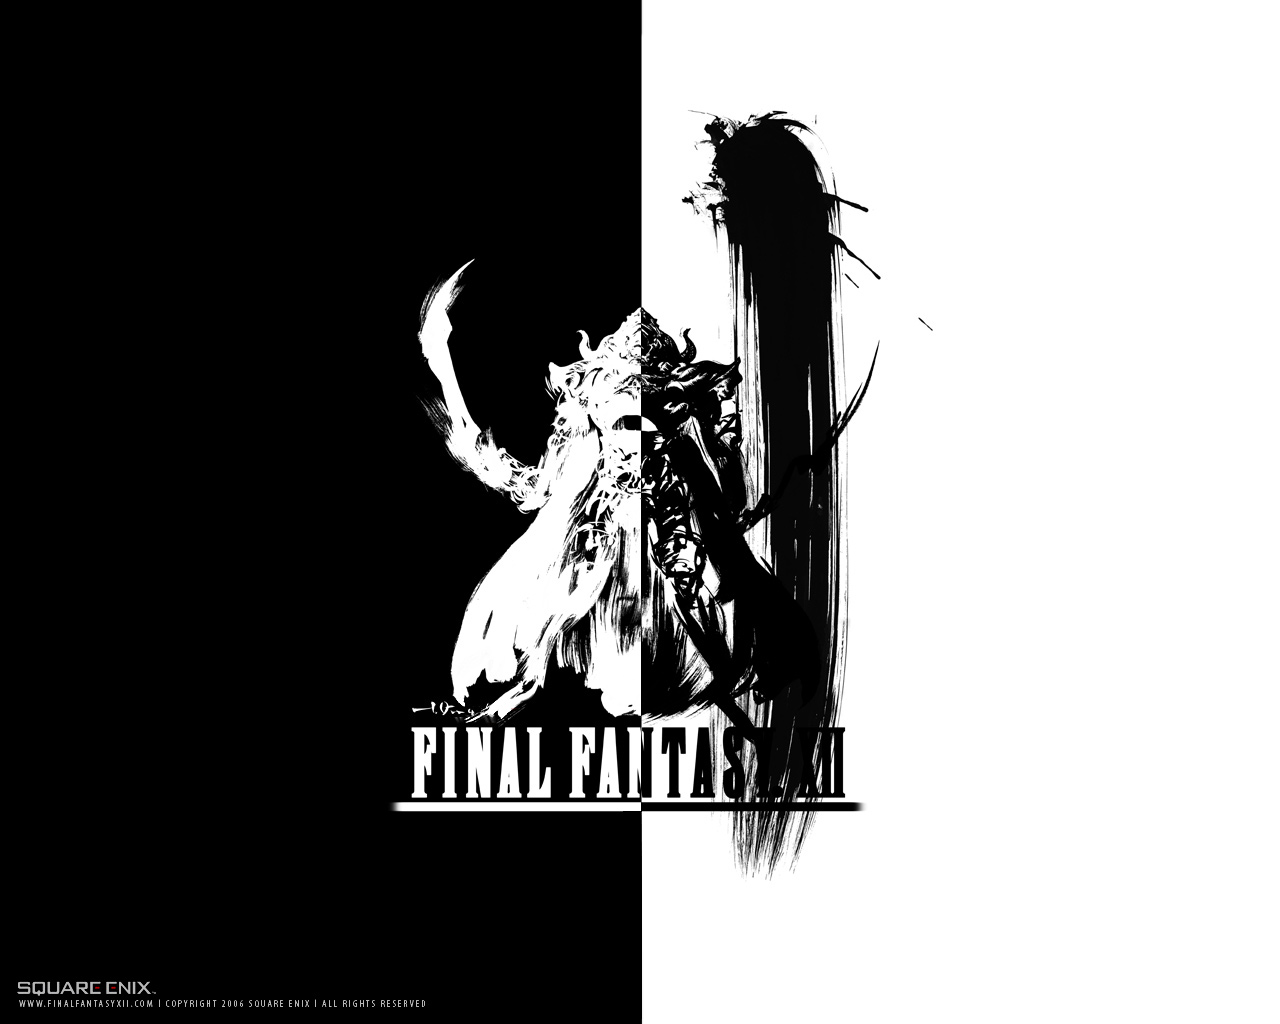 final_fantasy final_fantasy_xii logo